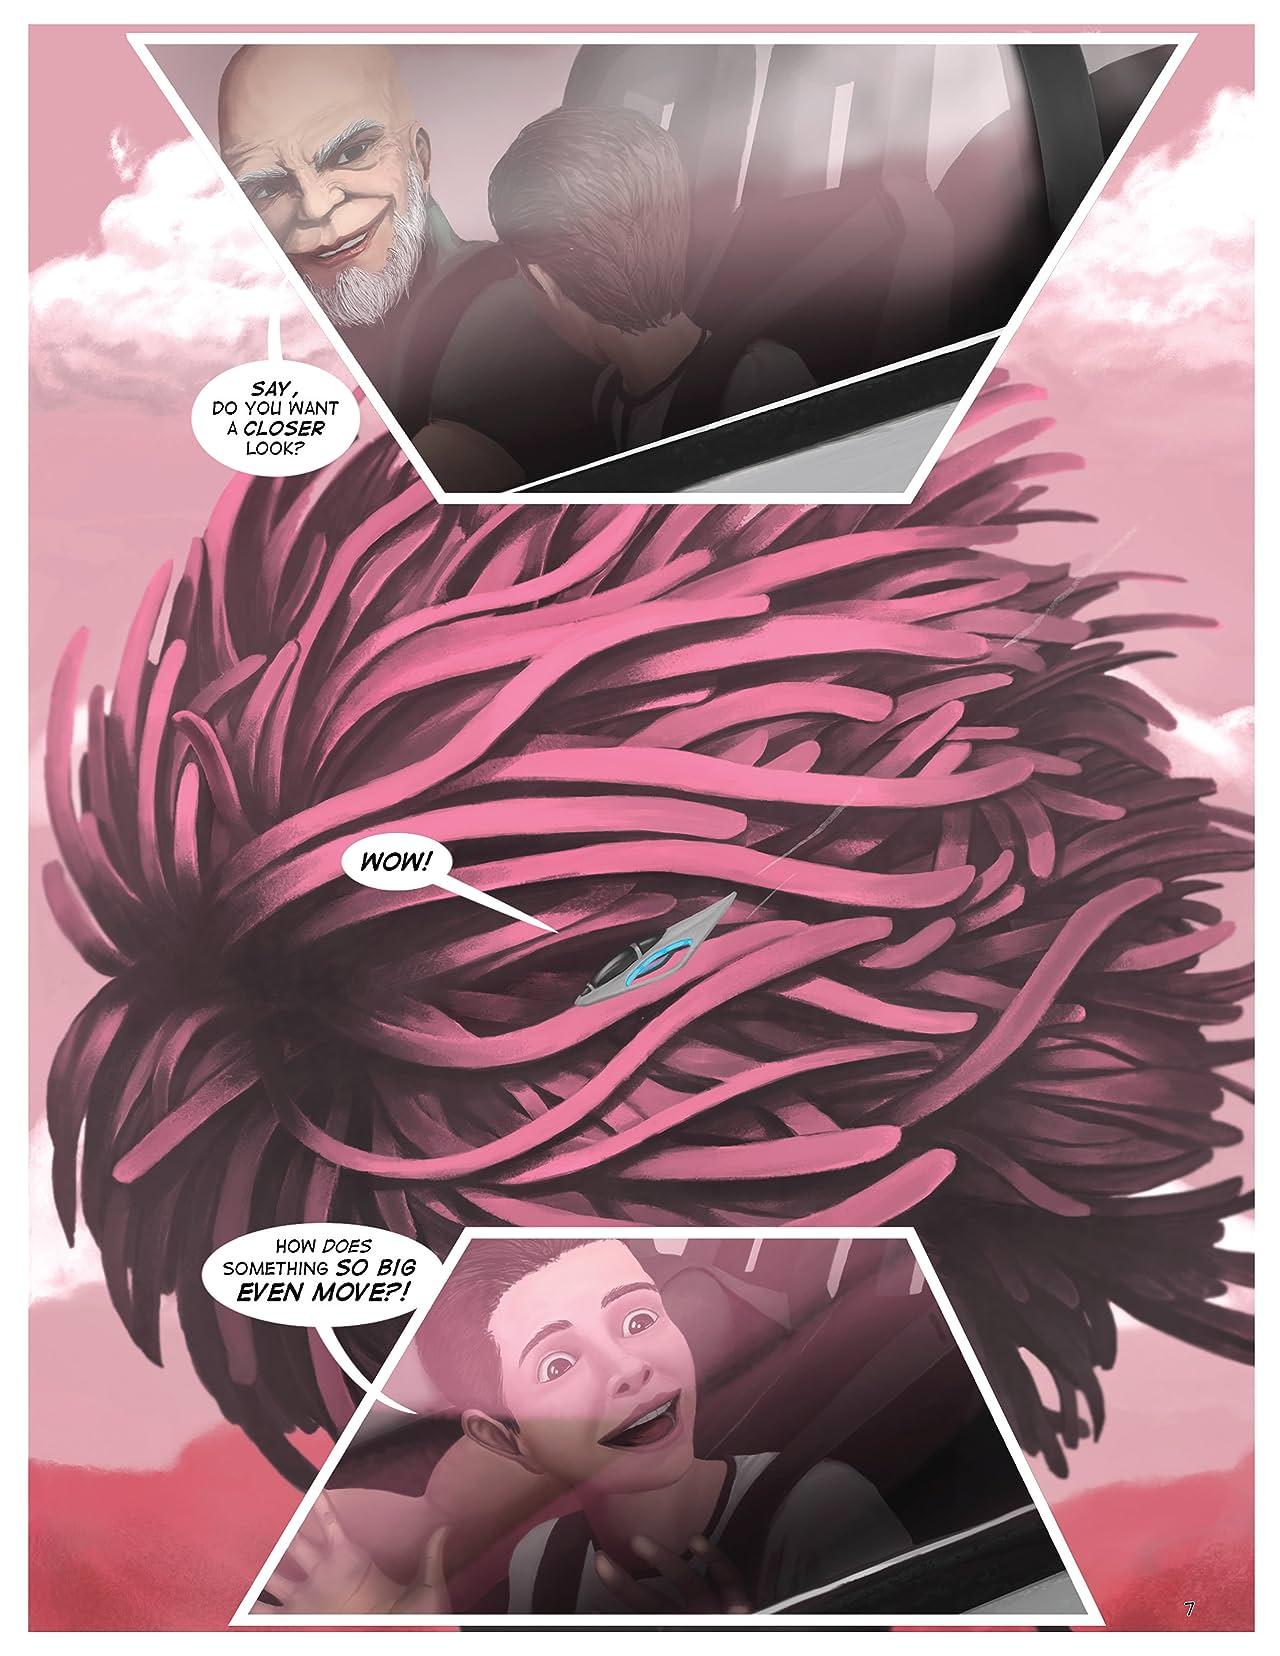 Numinosity Comics Vol. 1